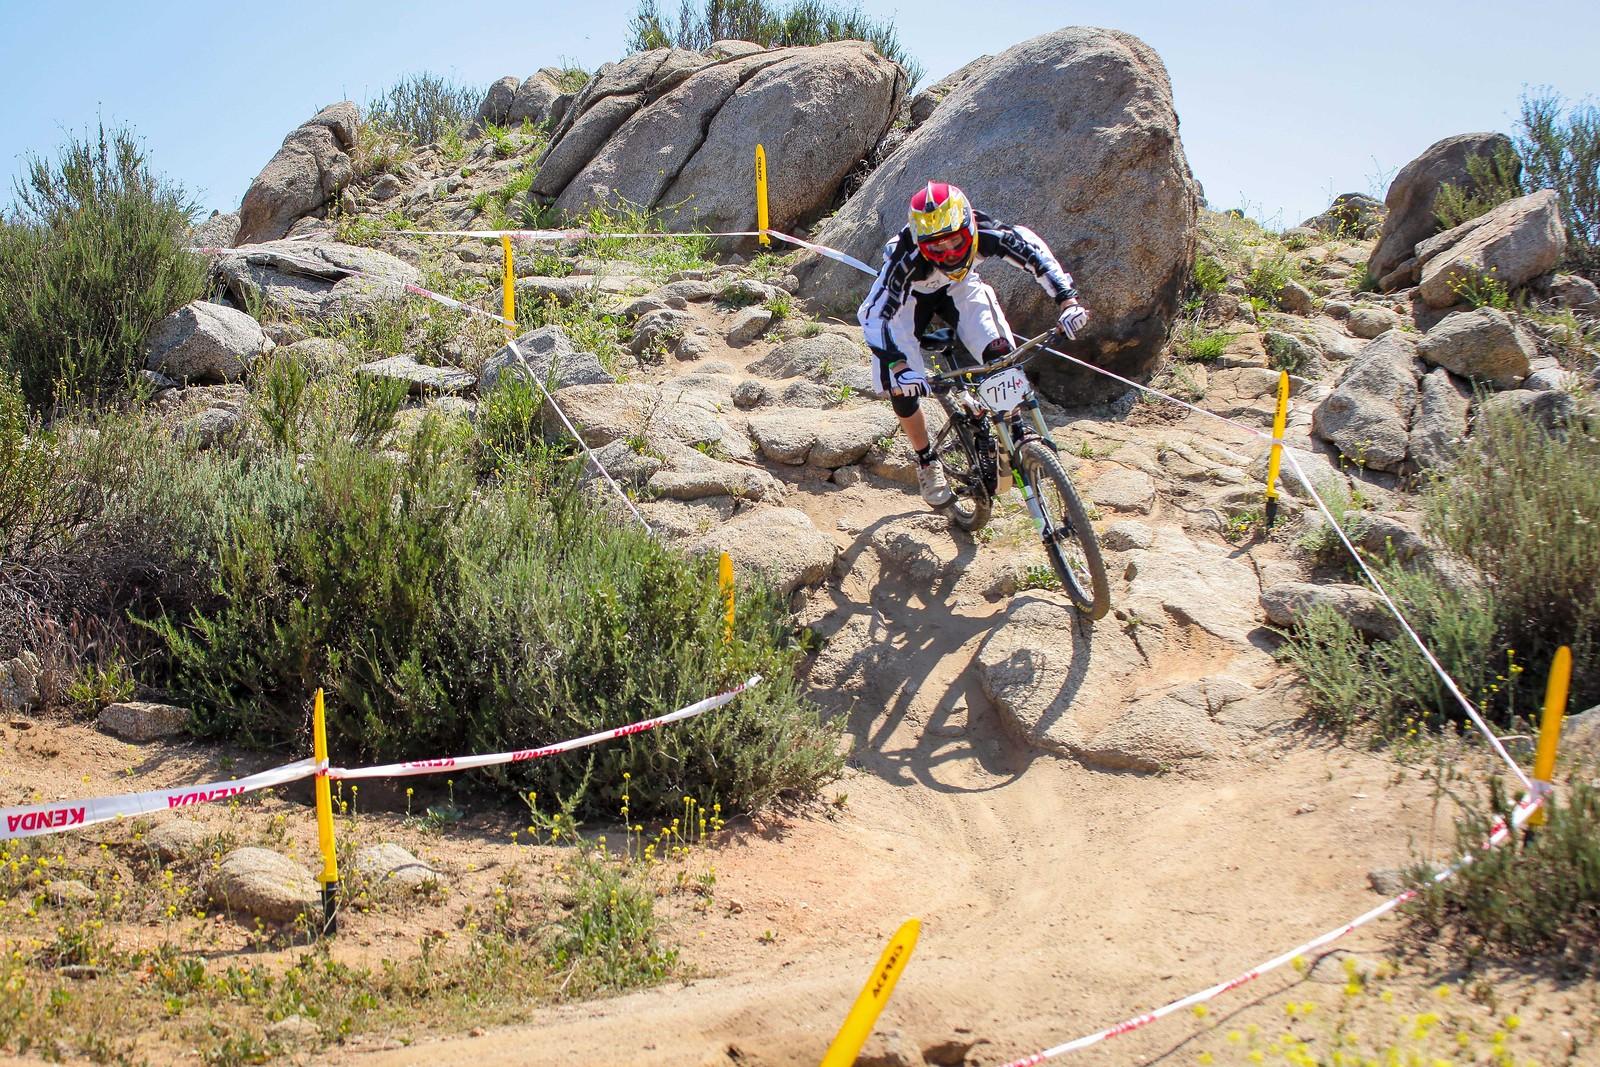 IMG 3255 - GnarHuck - Mountain Biking Pictures - Vital MTB